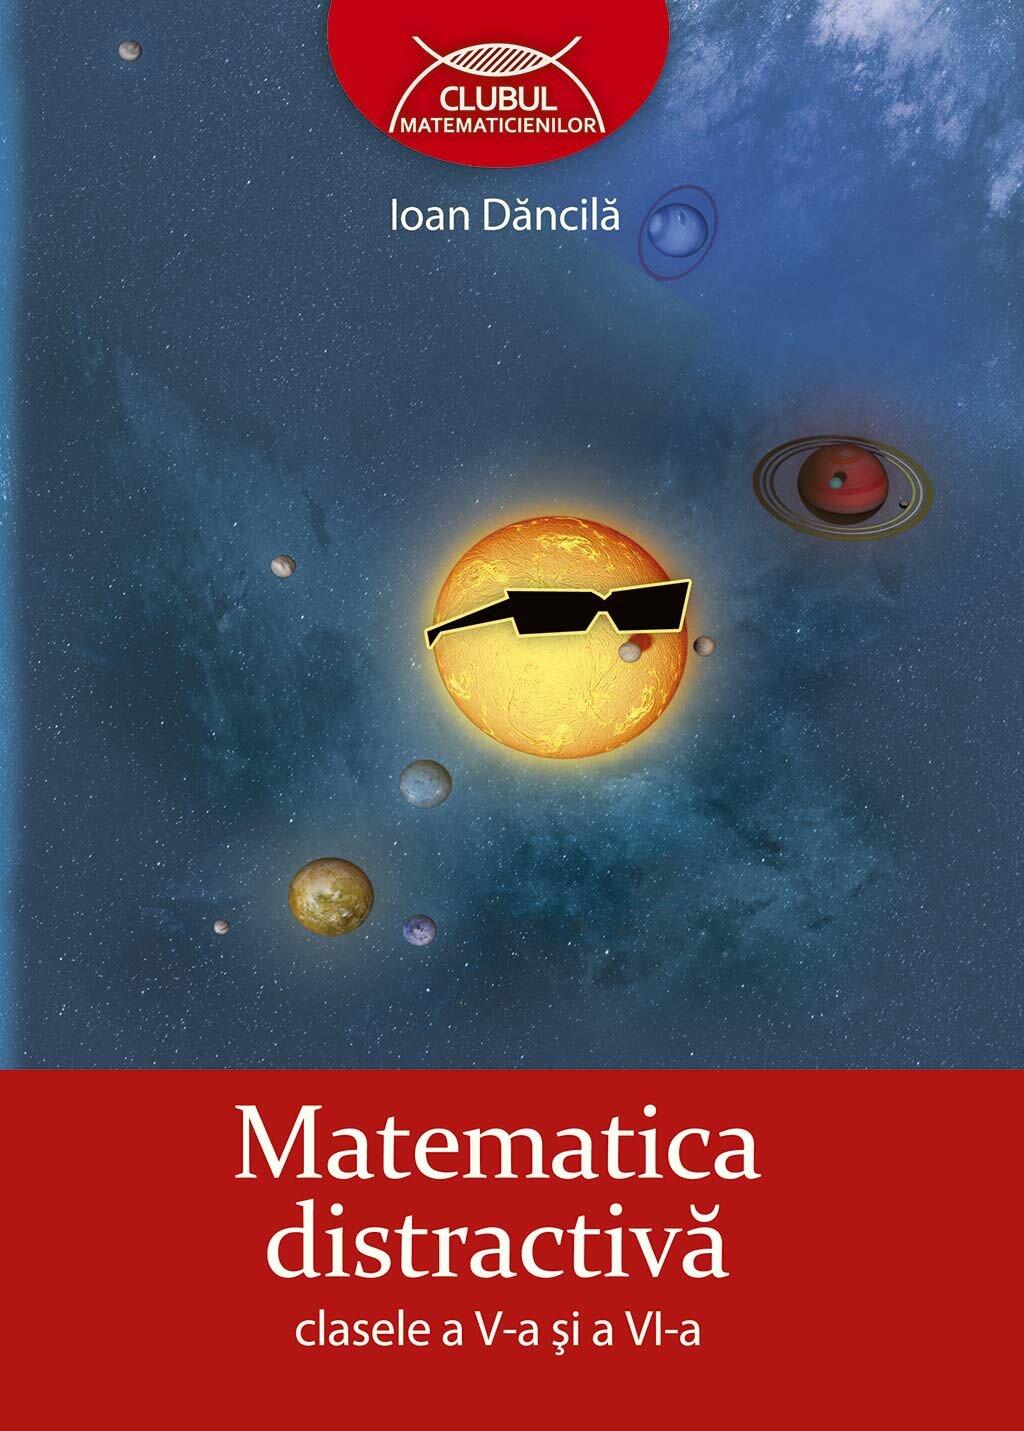 Matematica distractiva. Clasele a V-a si a VI-a (eBook)